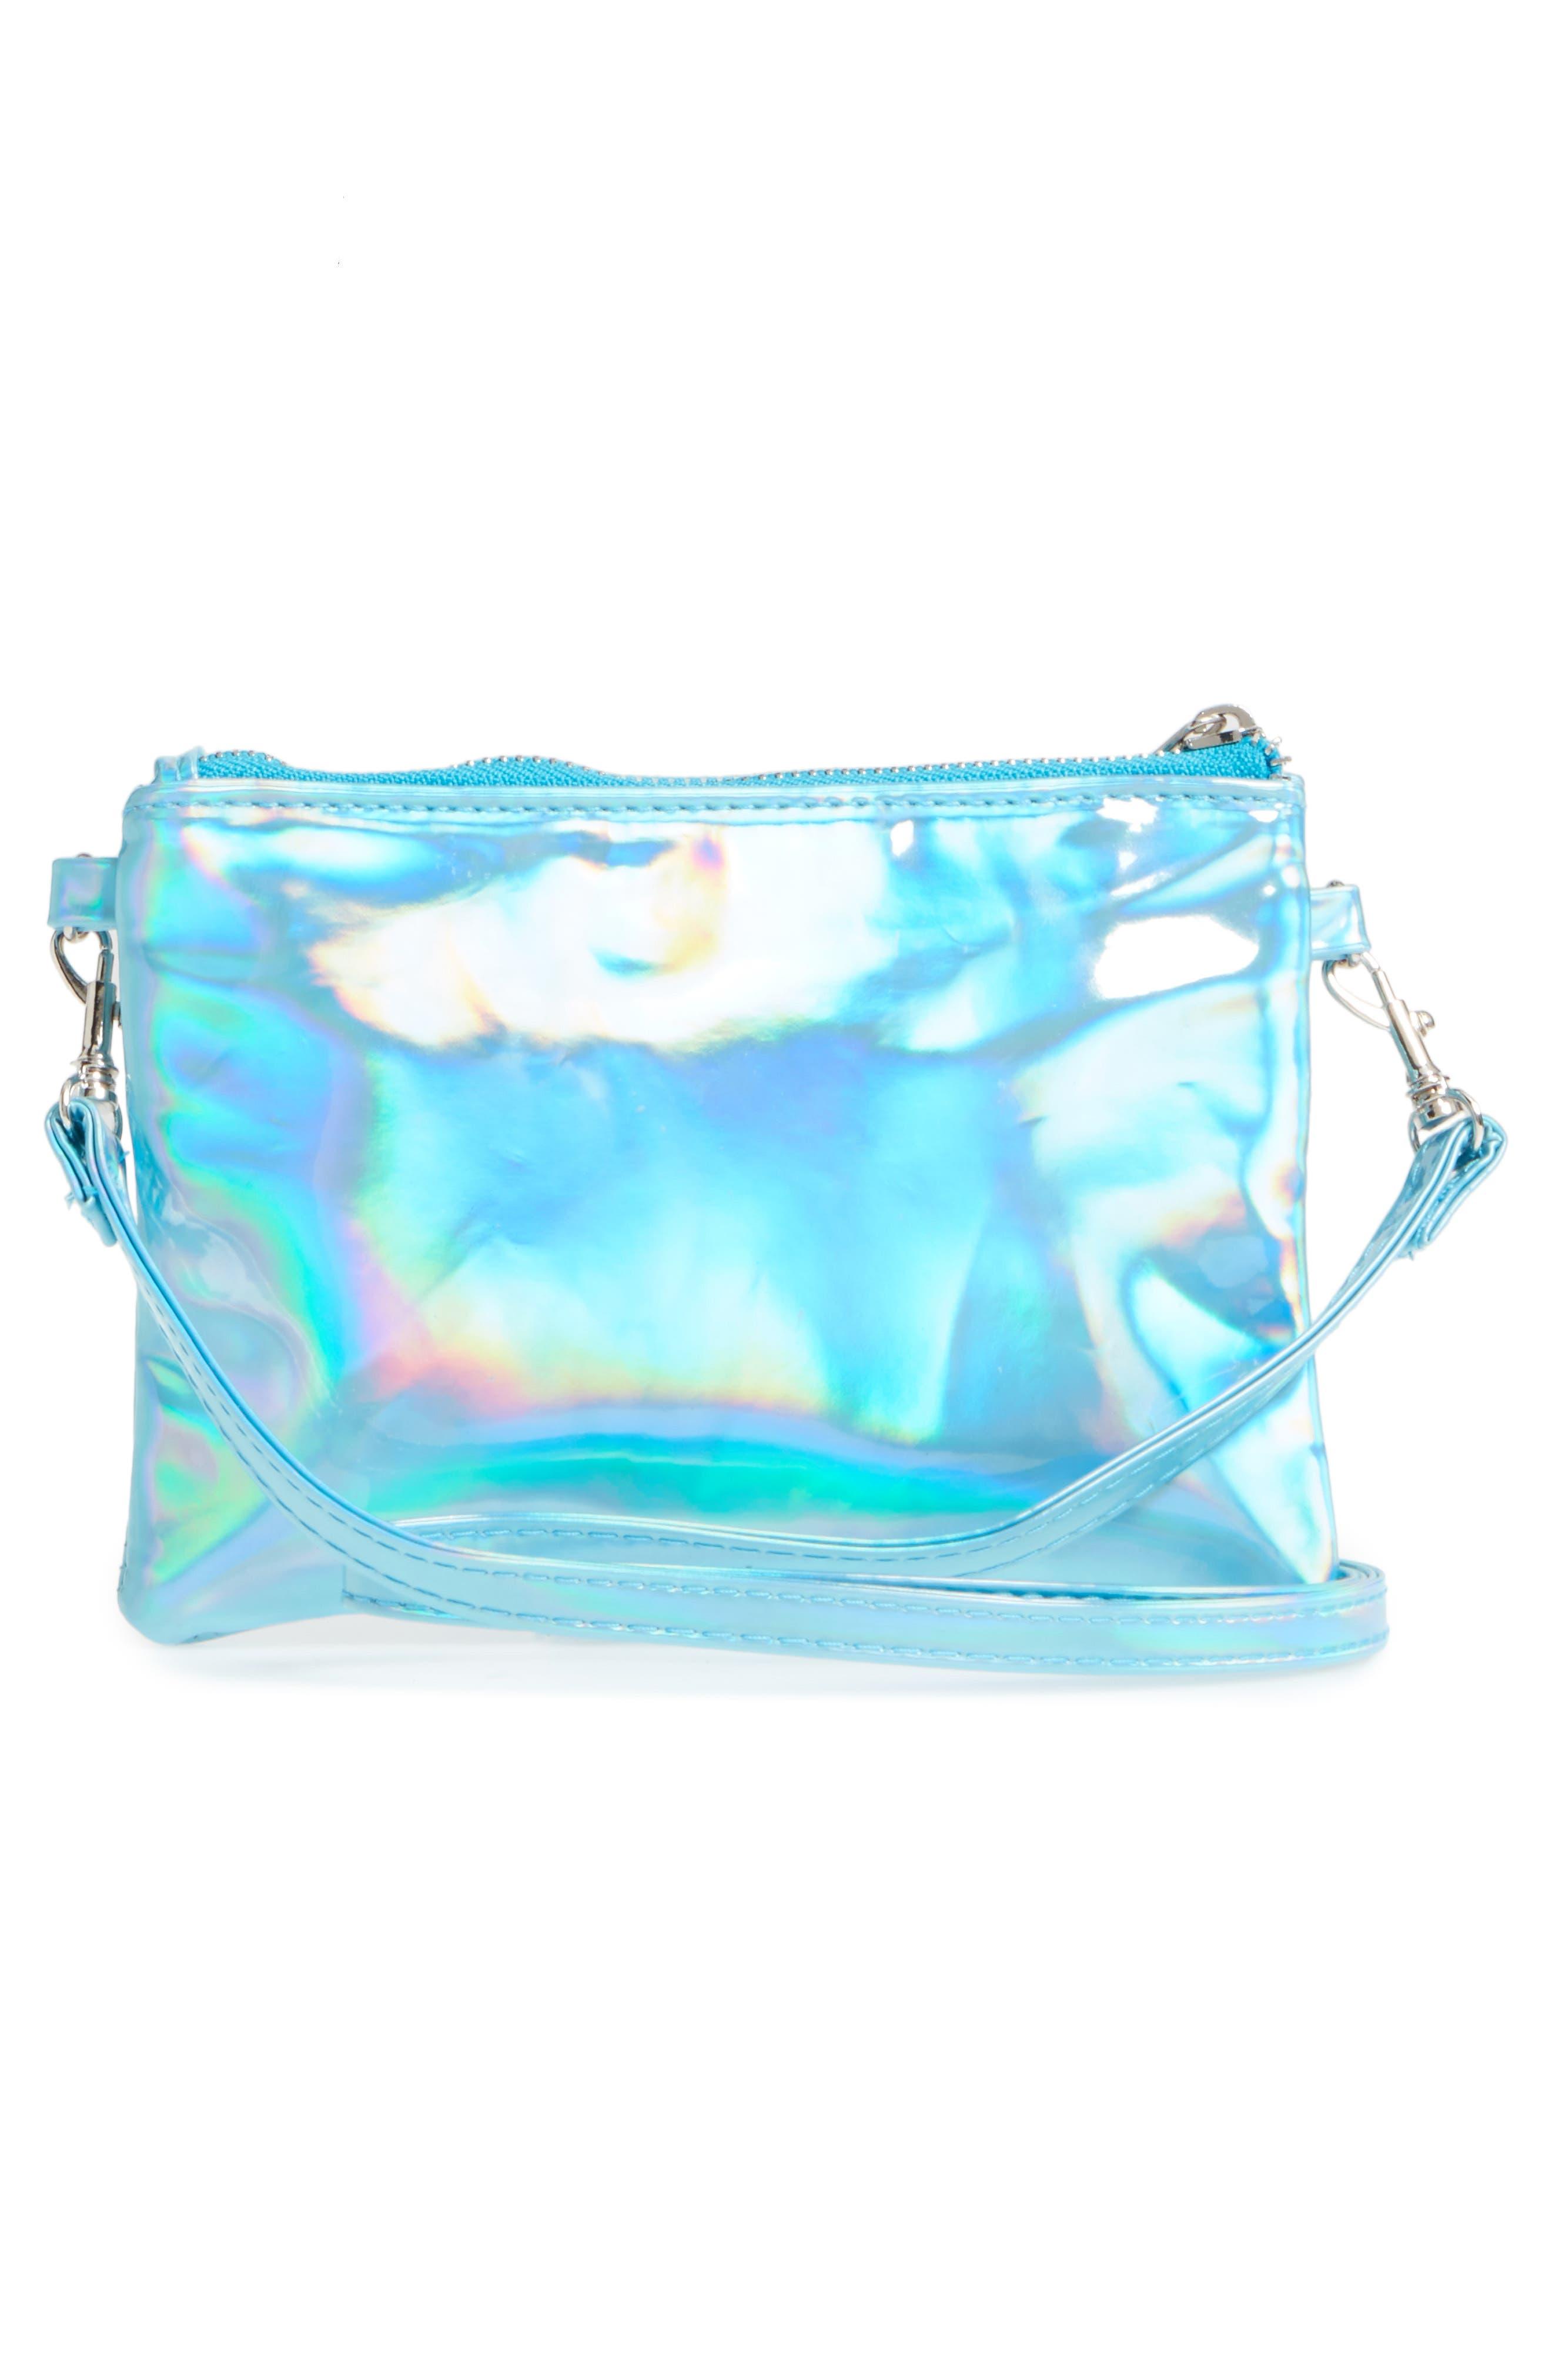 Capelli of New York Hologram Crossbody Bag,                             Alternate thumbnail 2, color,                             401